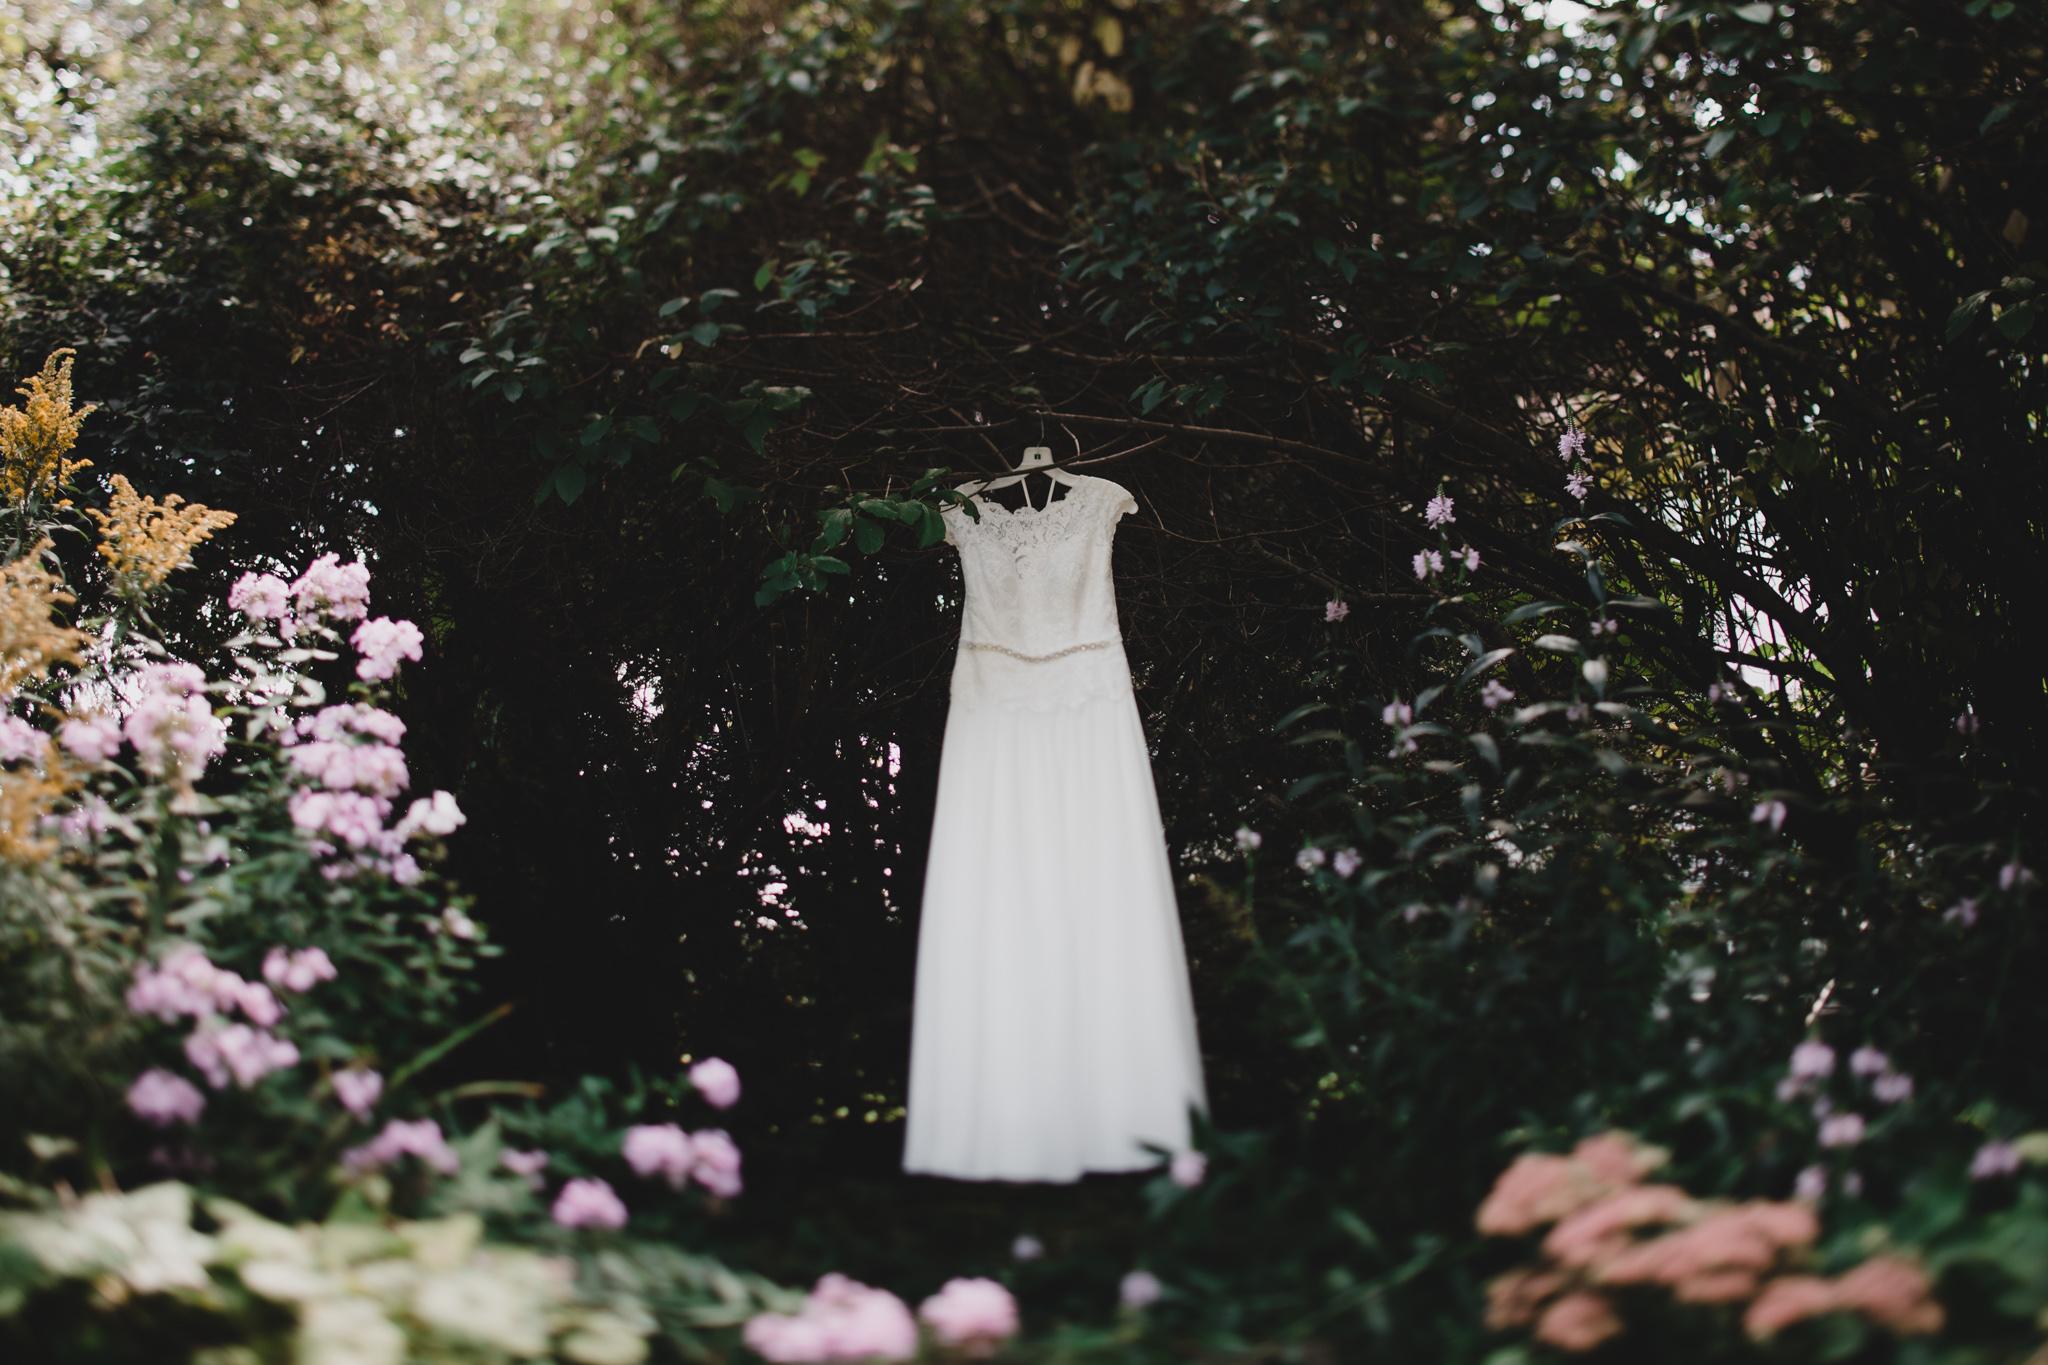 095-WEB-Jonathan-Kuhn-Photography-Sarah-Tyler-Wedding-0987.jpg